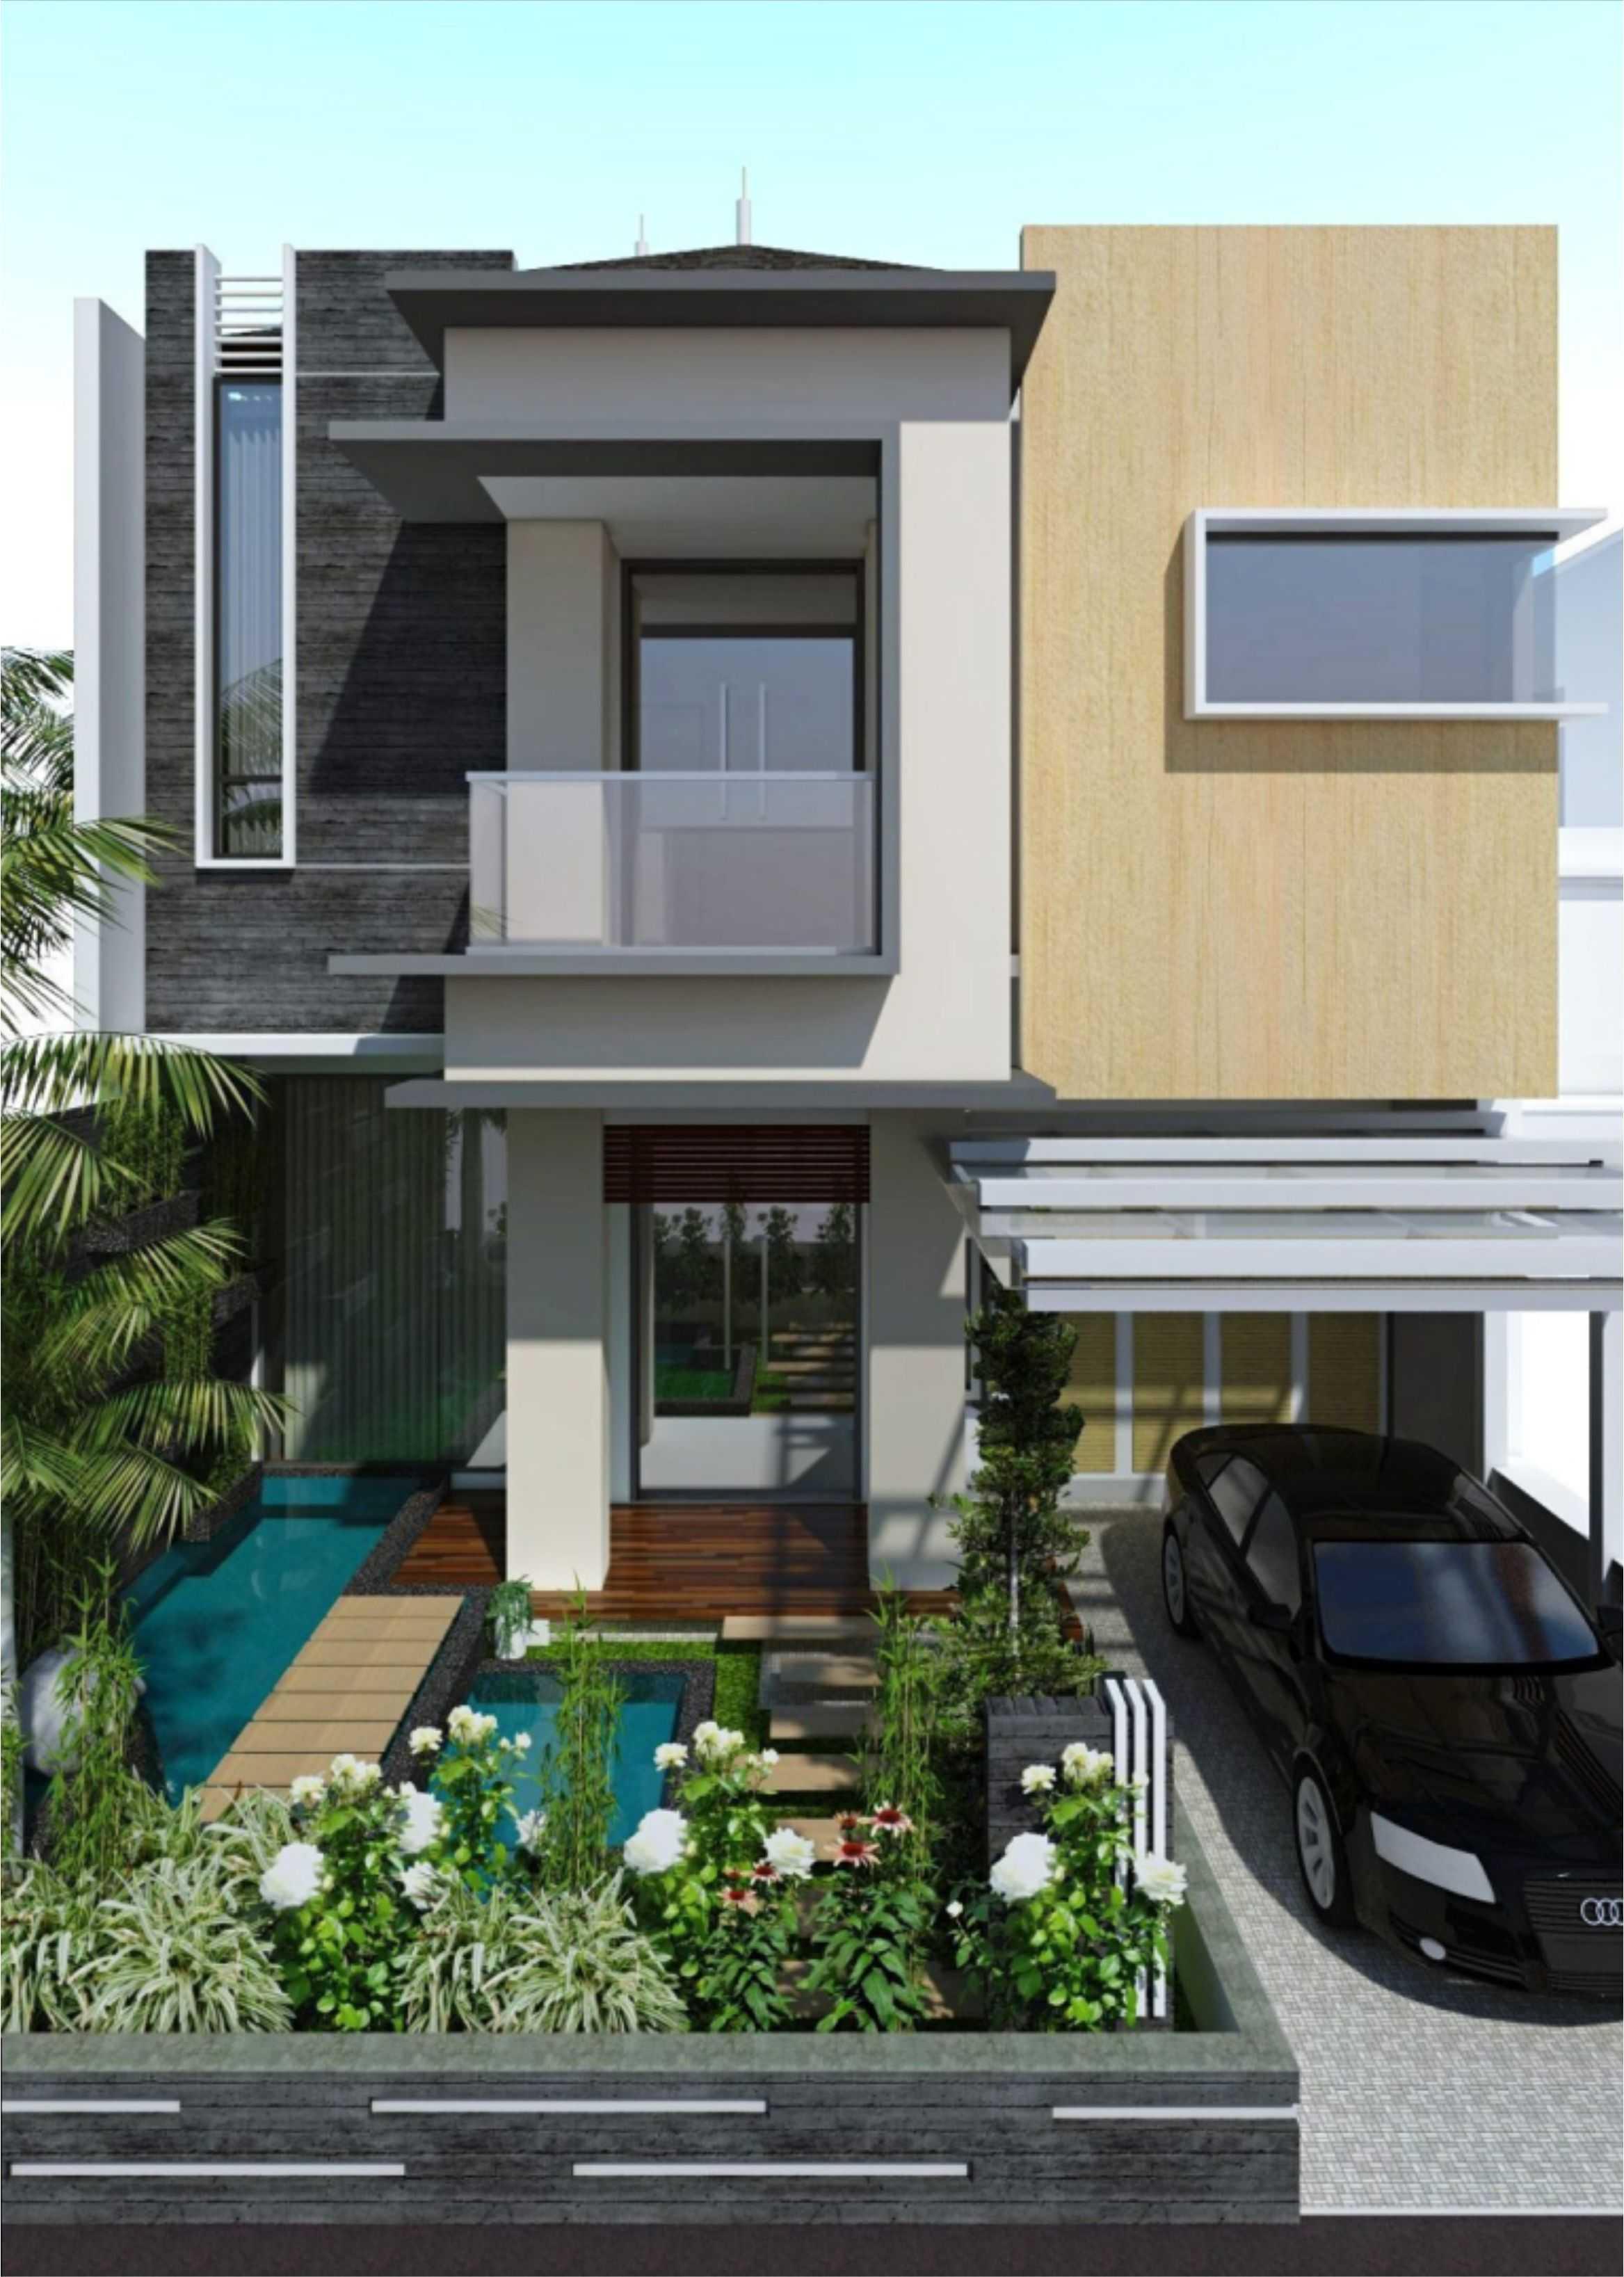 Miv Architects (Ar. Muhammad Ikhsan Hamiru, Iai & Partners) Desain Rehabilitasi Rumah Phinisi Makassar   With Pt.dap Makassar Makassar Untitled-1Aaa Modern  26095